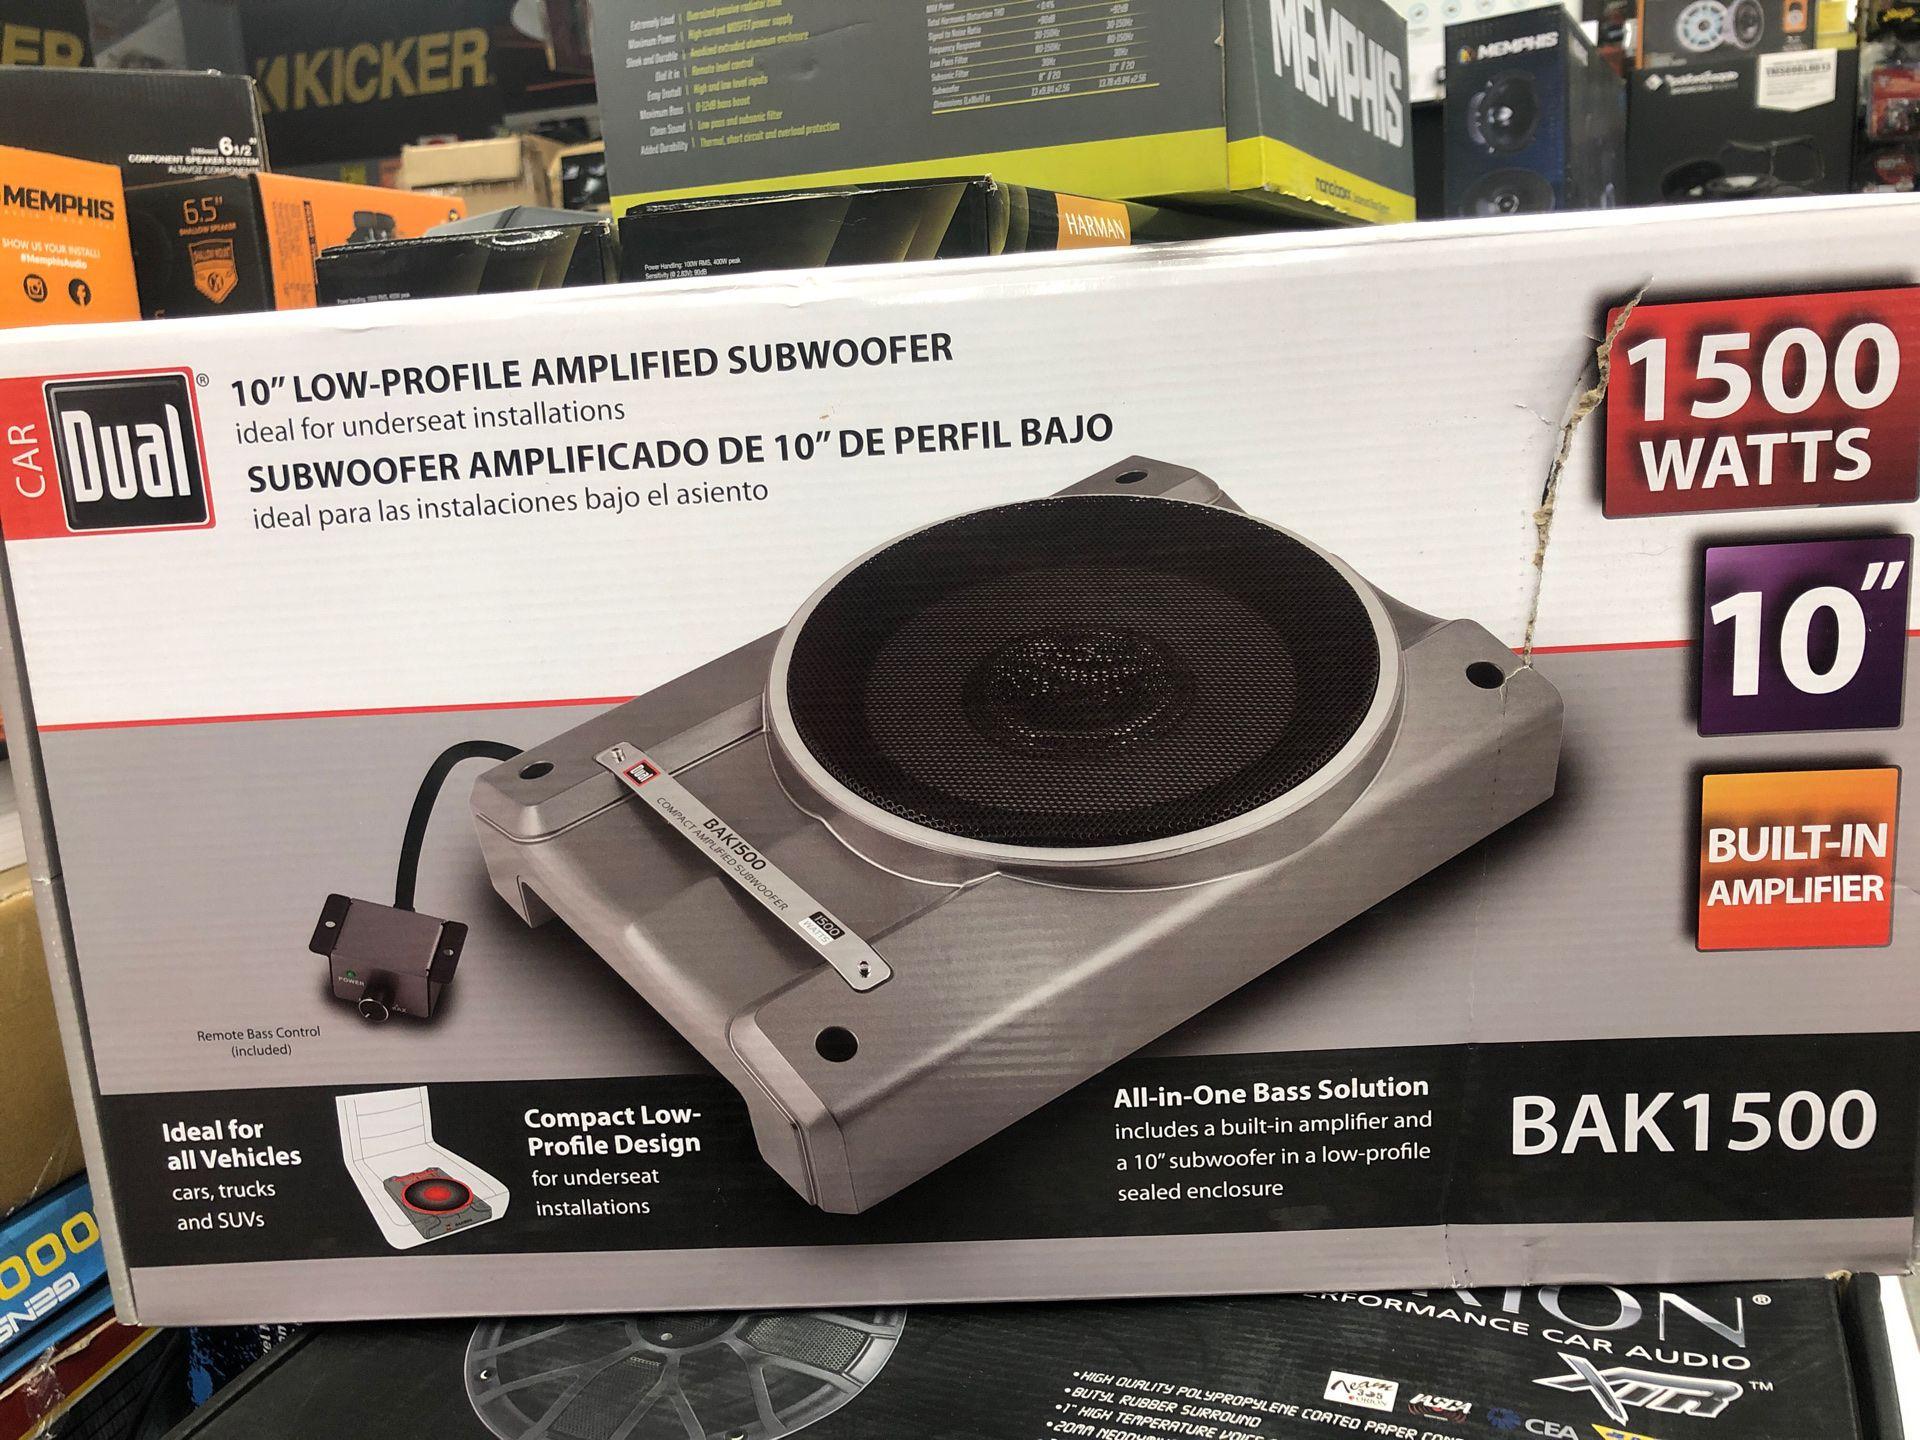 DAk 1500 watts subwoofer and box amplifier